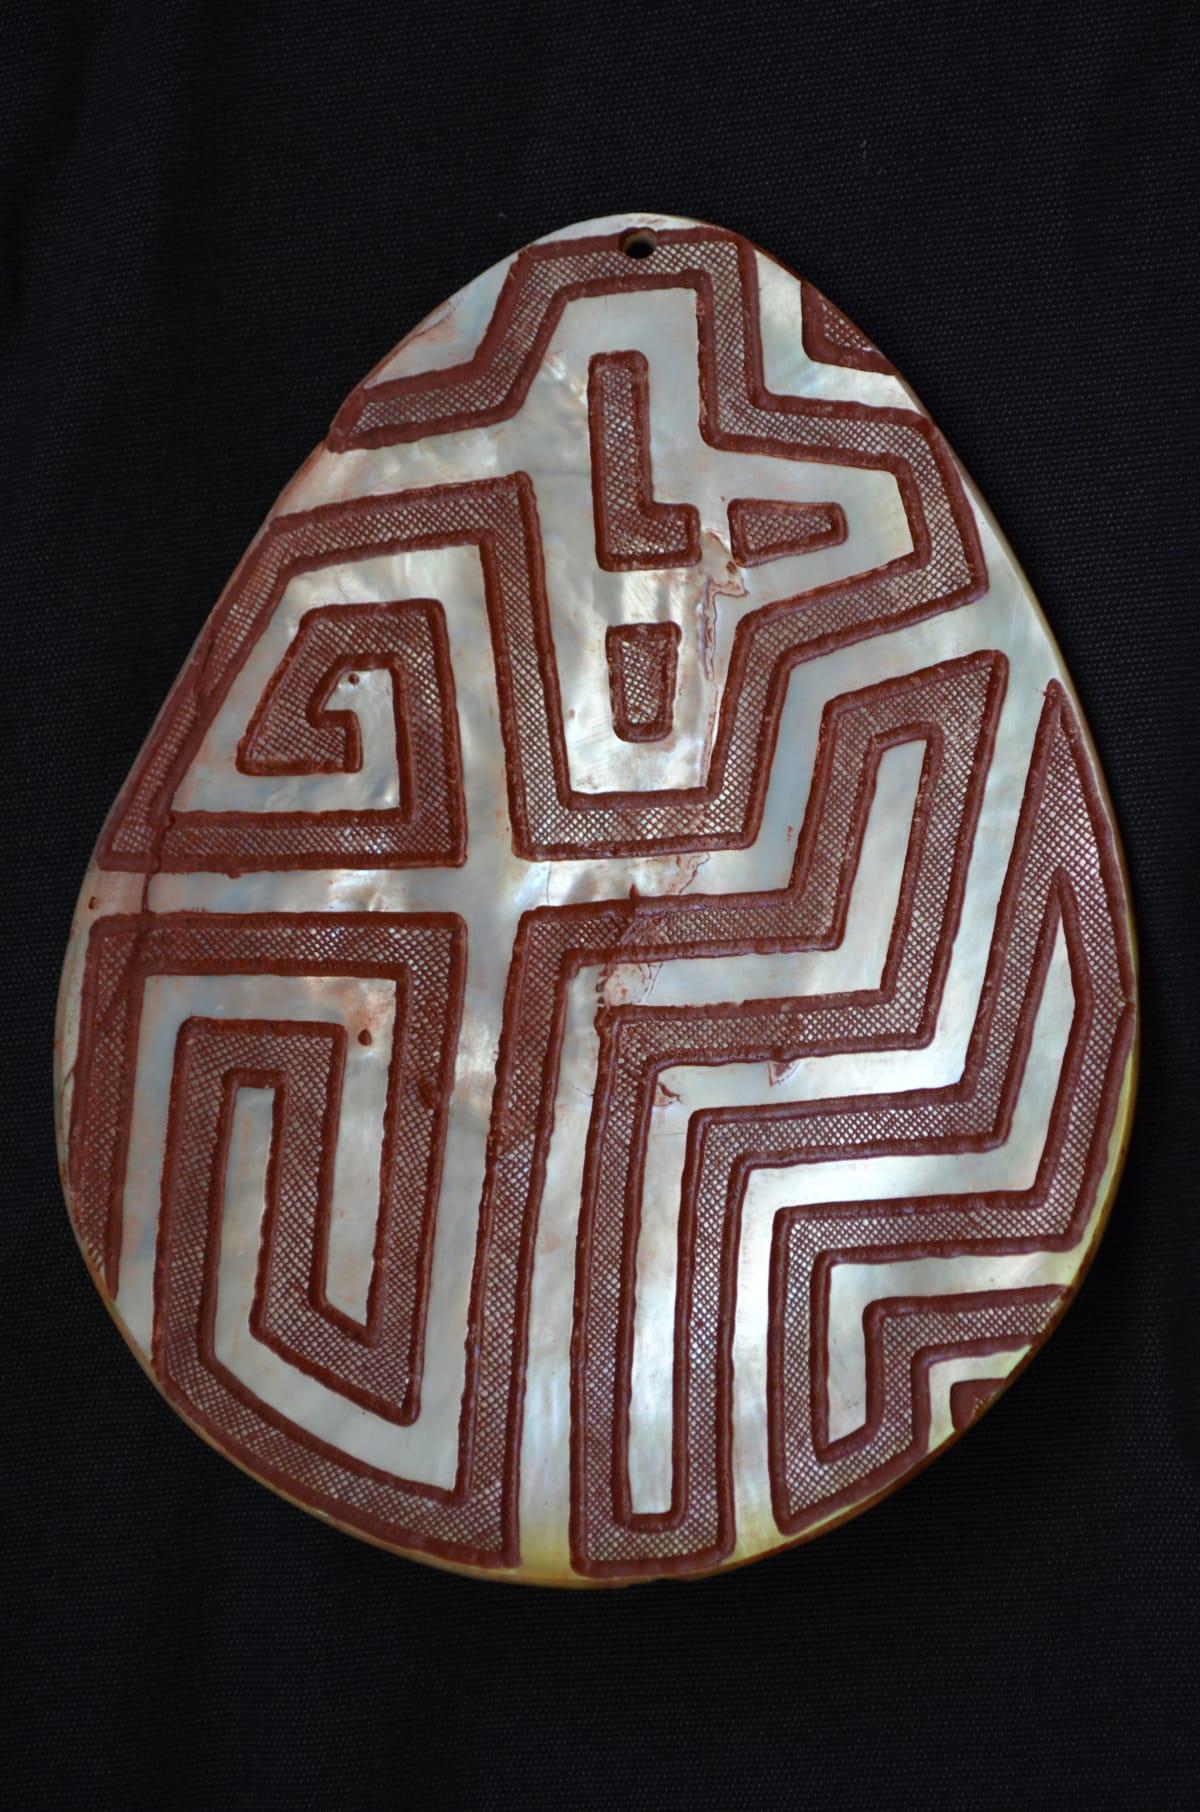 Sebastian Arrow Jalinyi ochre carving on pearlshell 16.5 x 15 cm